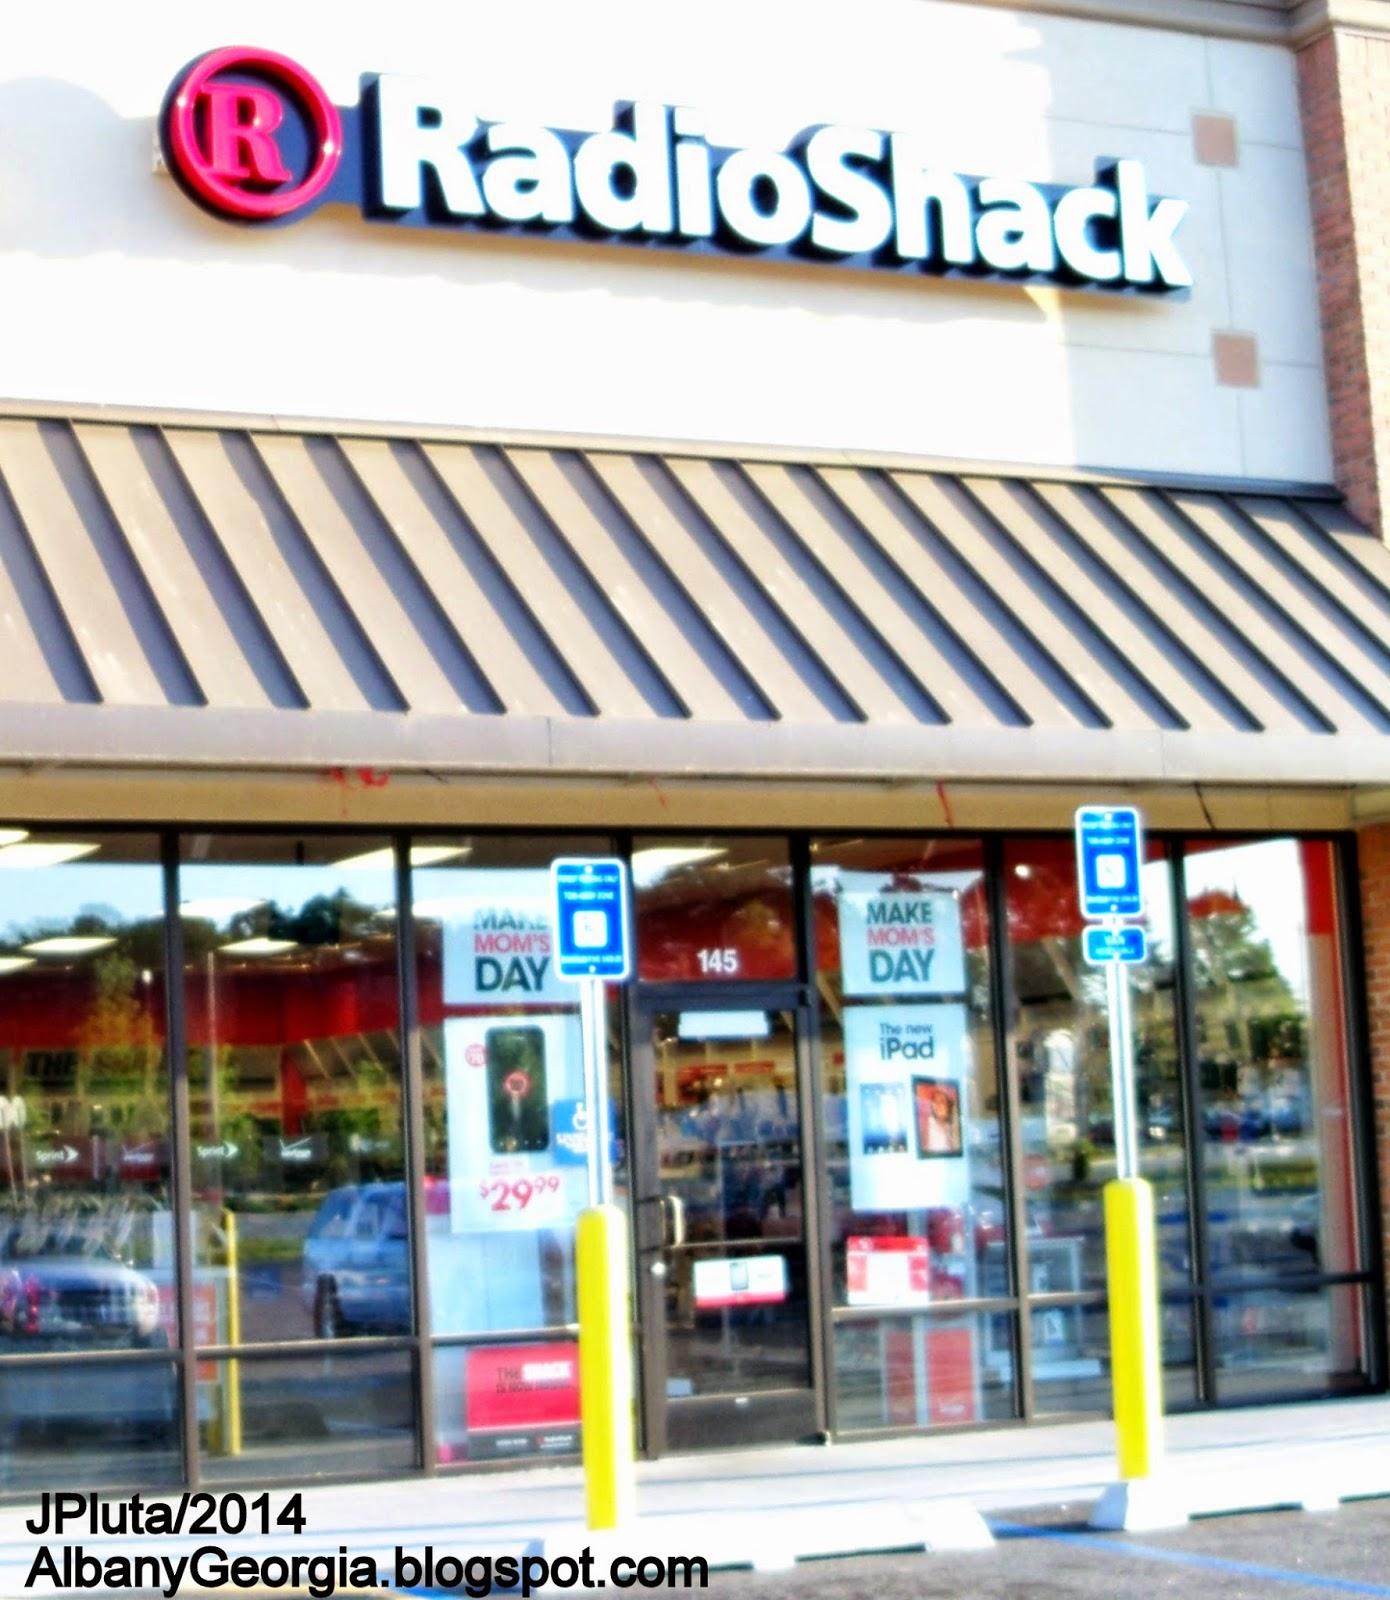 Radio Shack Stores: ALBANY GEORGIA Dougherty Restaurant Bank Hotel Attorney Dr